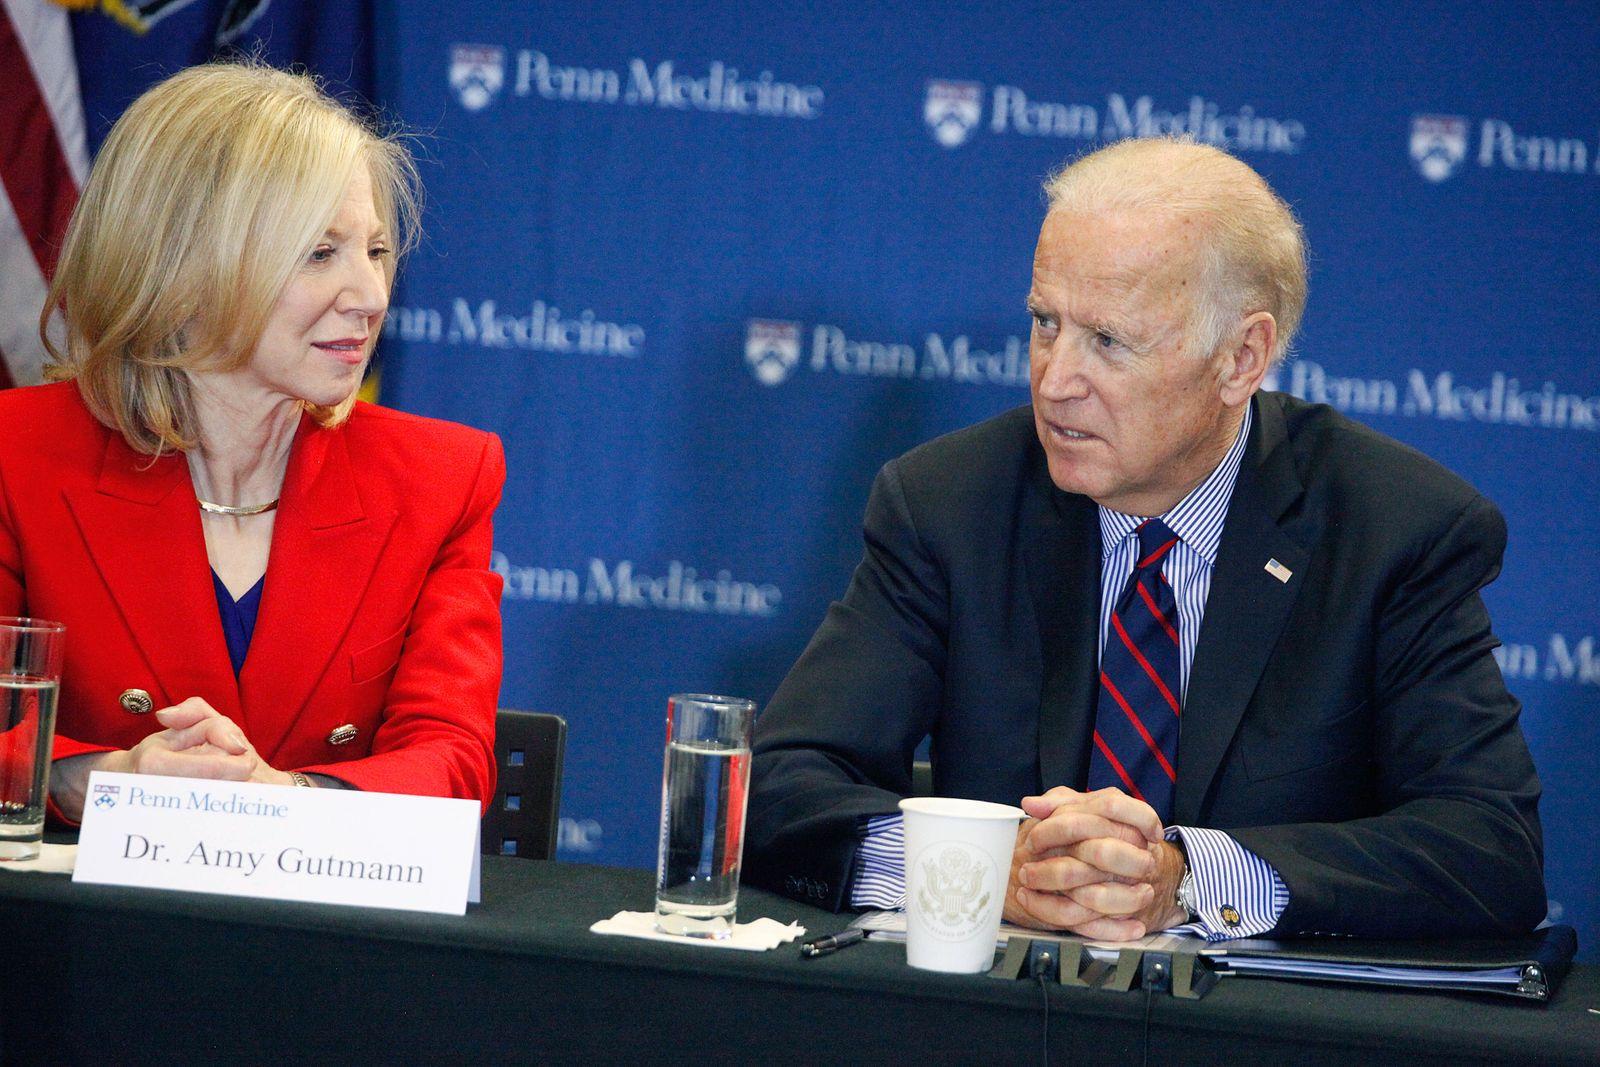 Vice President Joe Biden Launches Moonshot Initiative